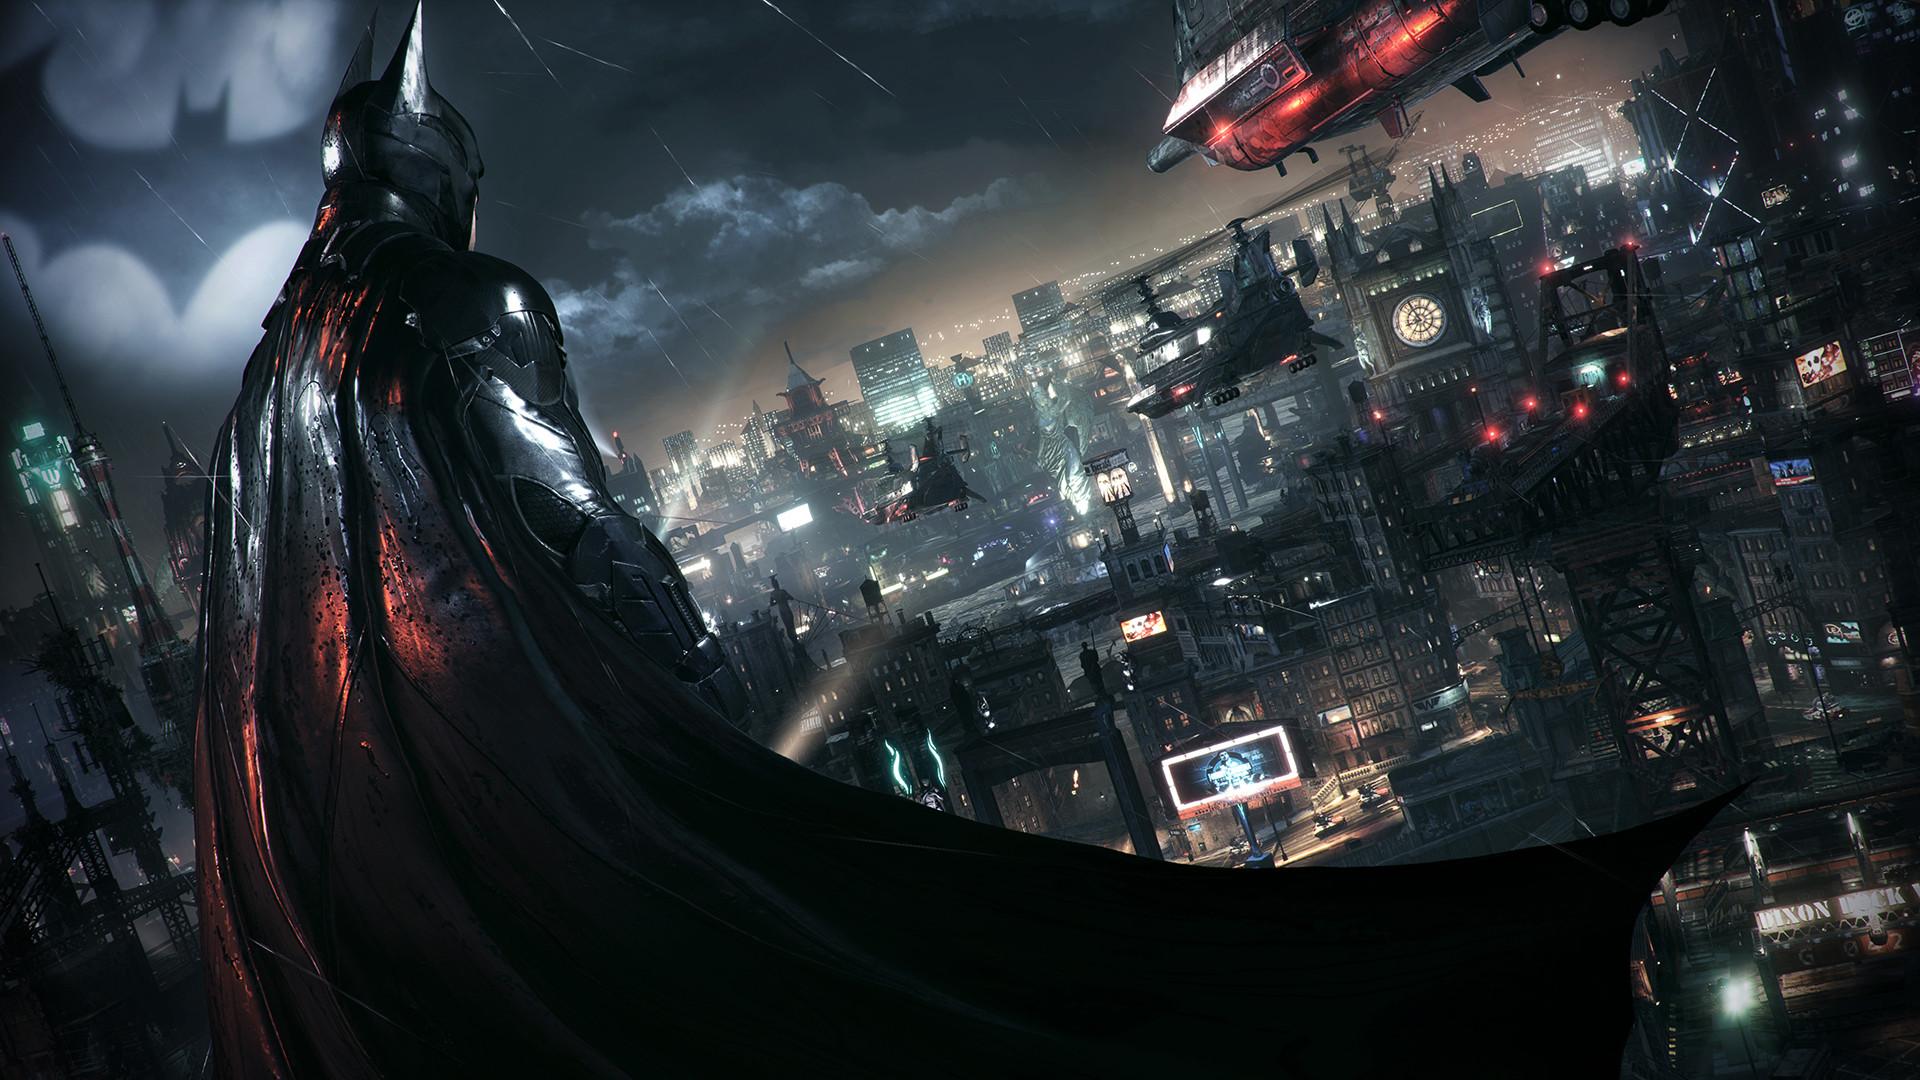 … batman arkham knight wallpaper on wallpaperget com …